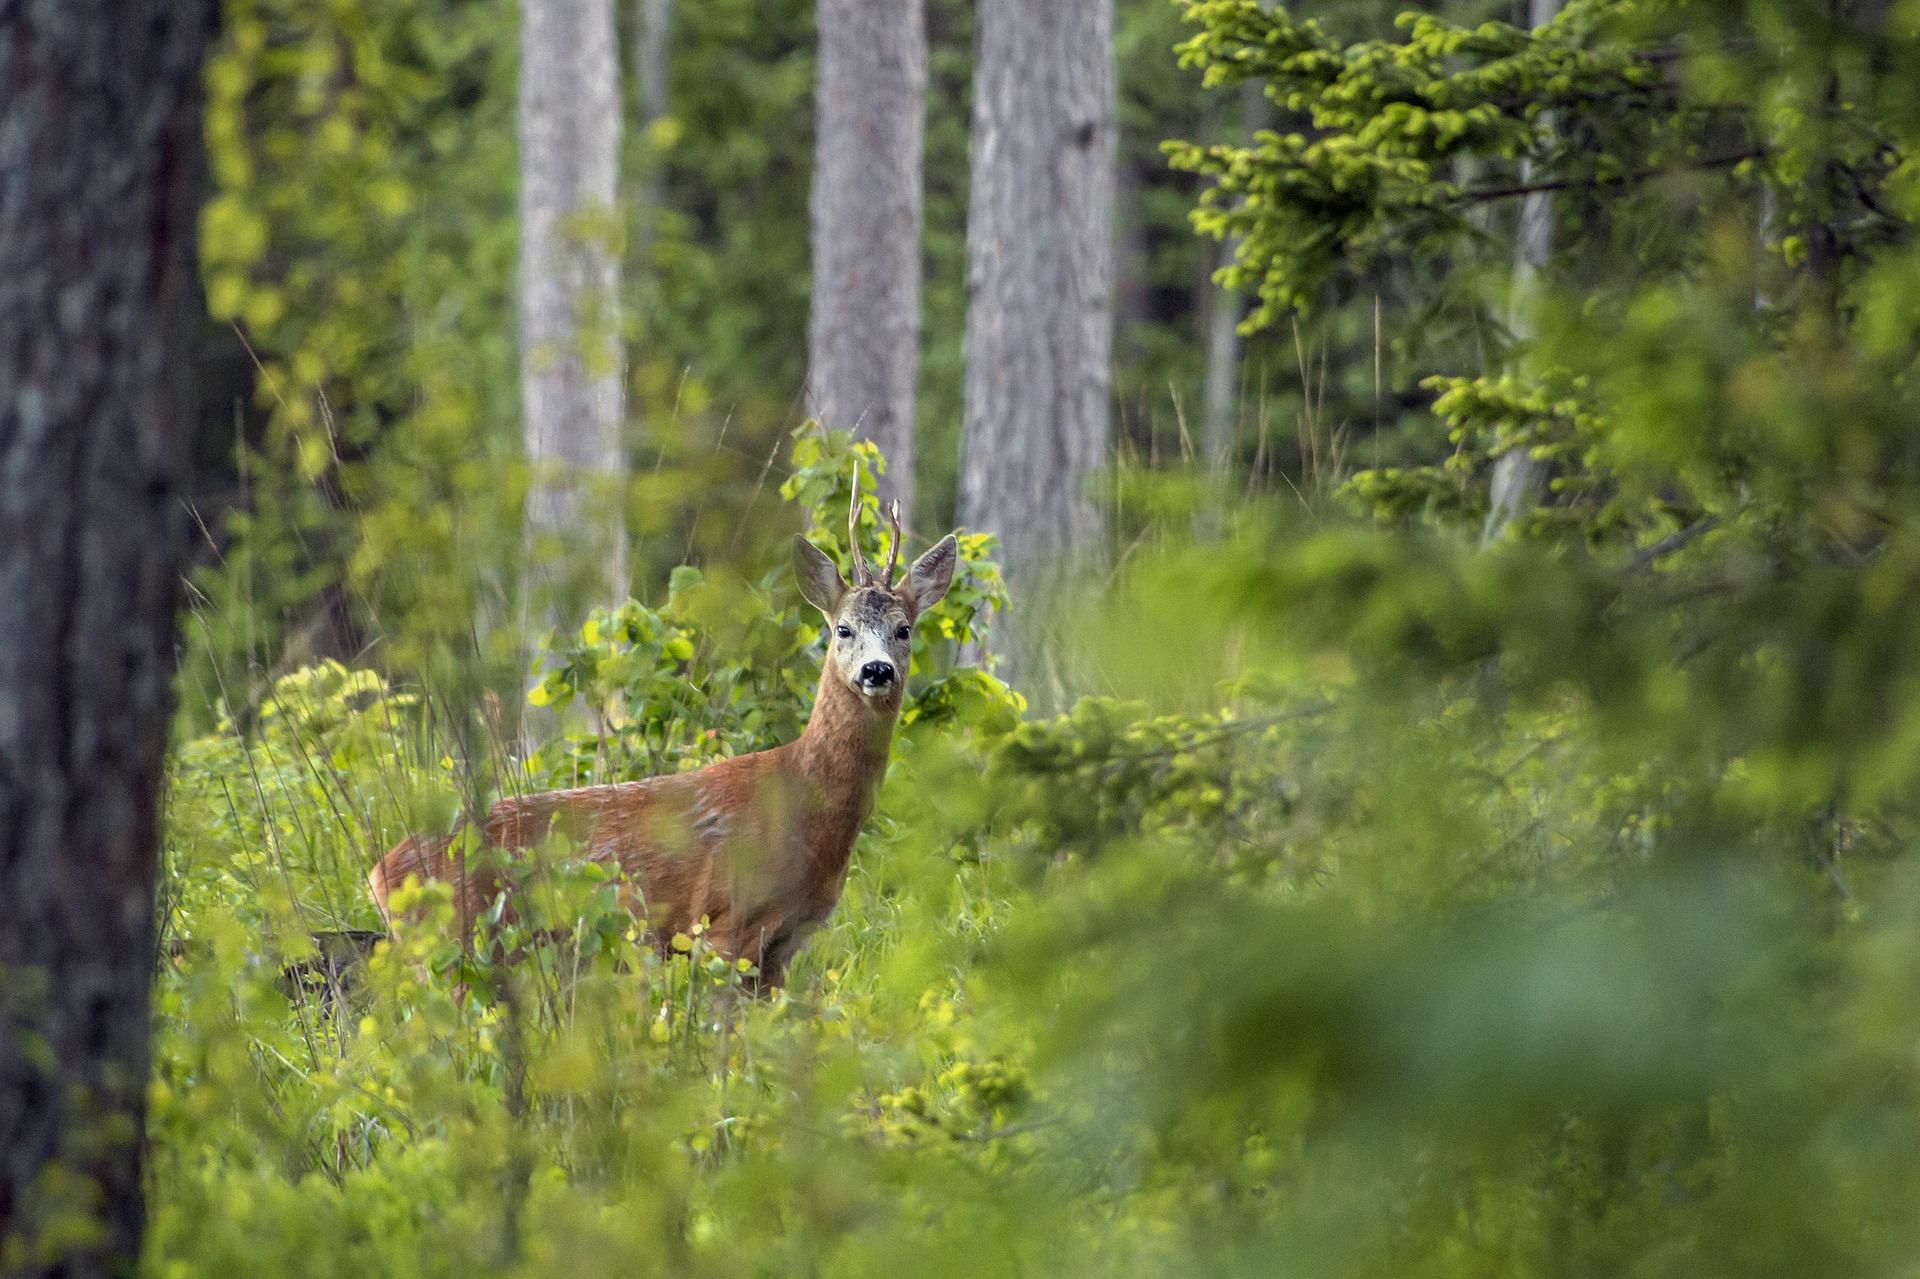 Haajna: Rat za šumu